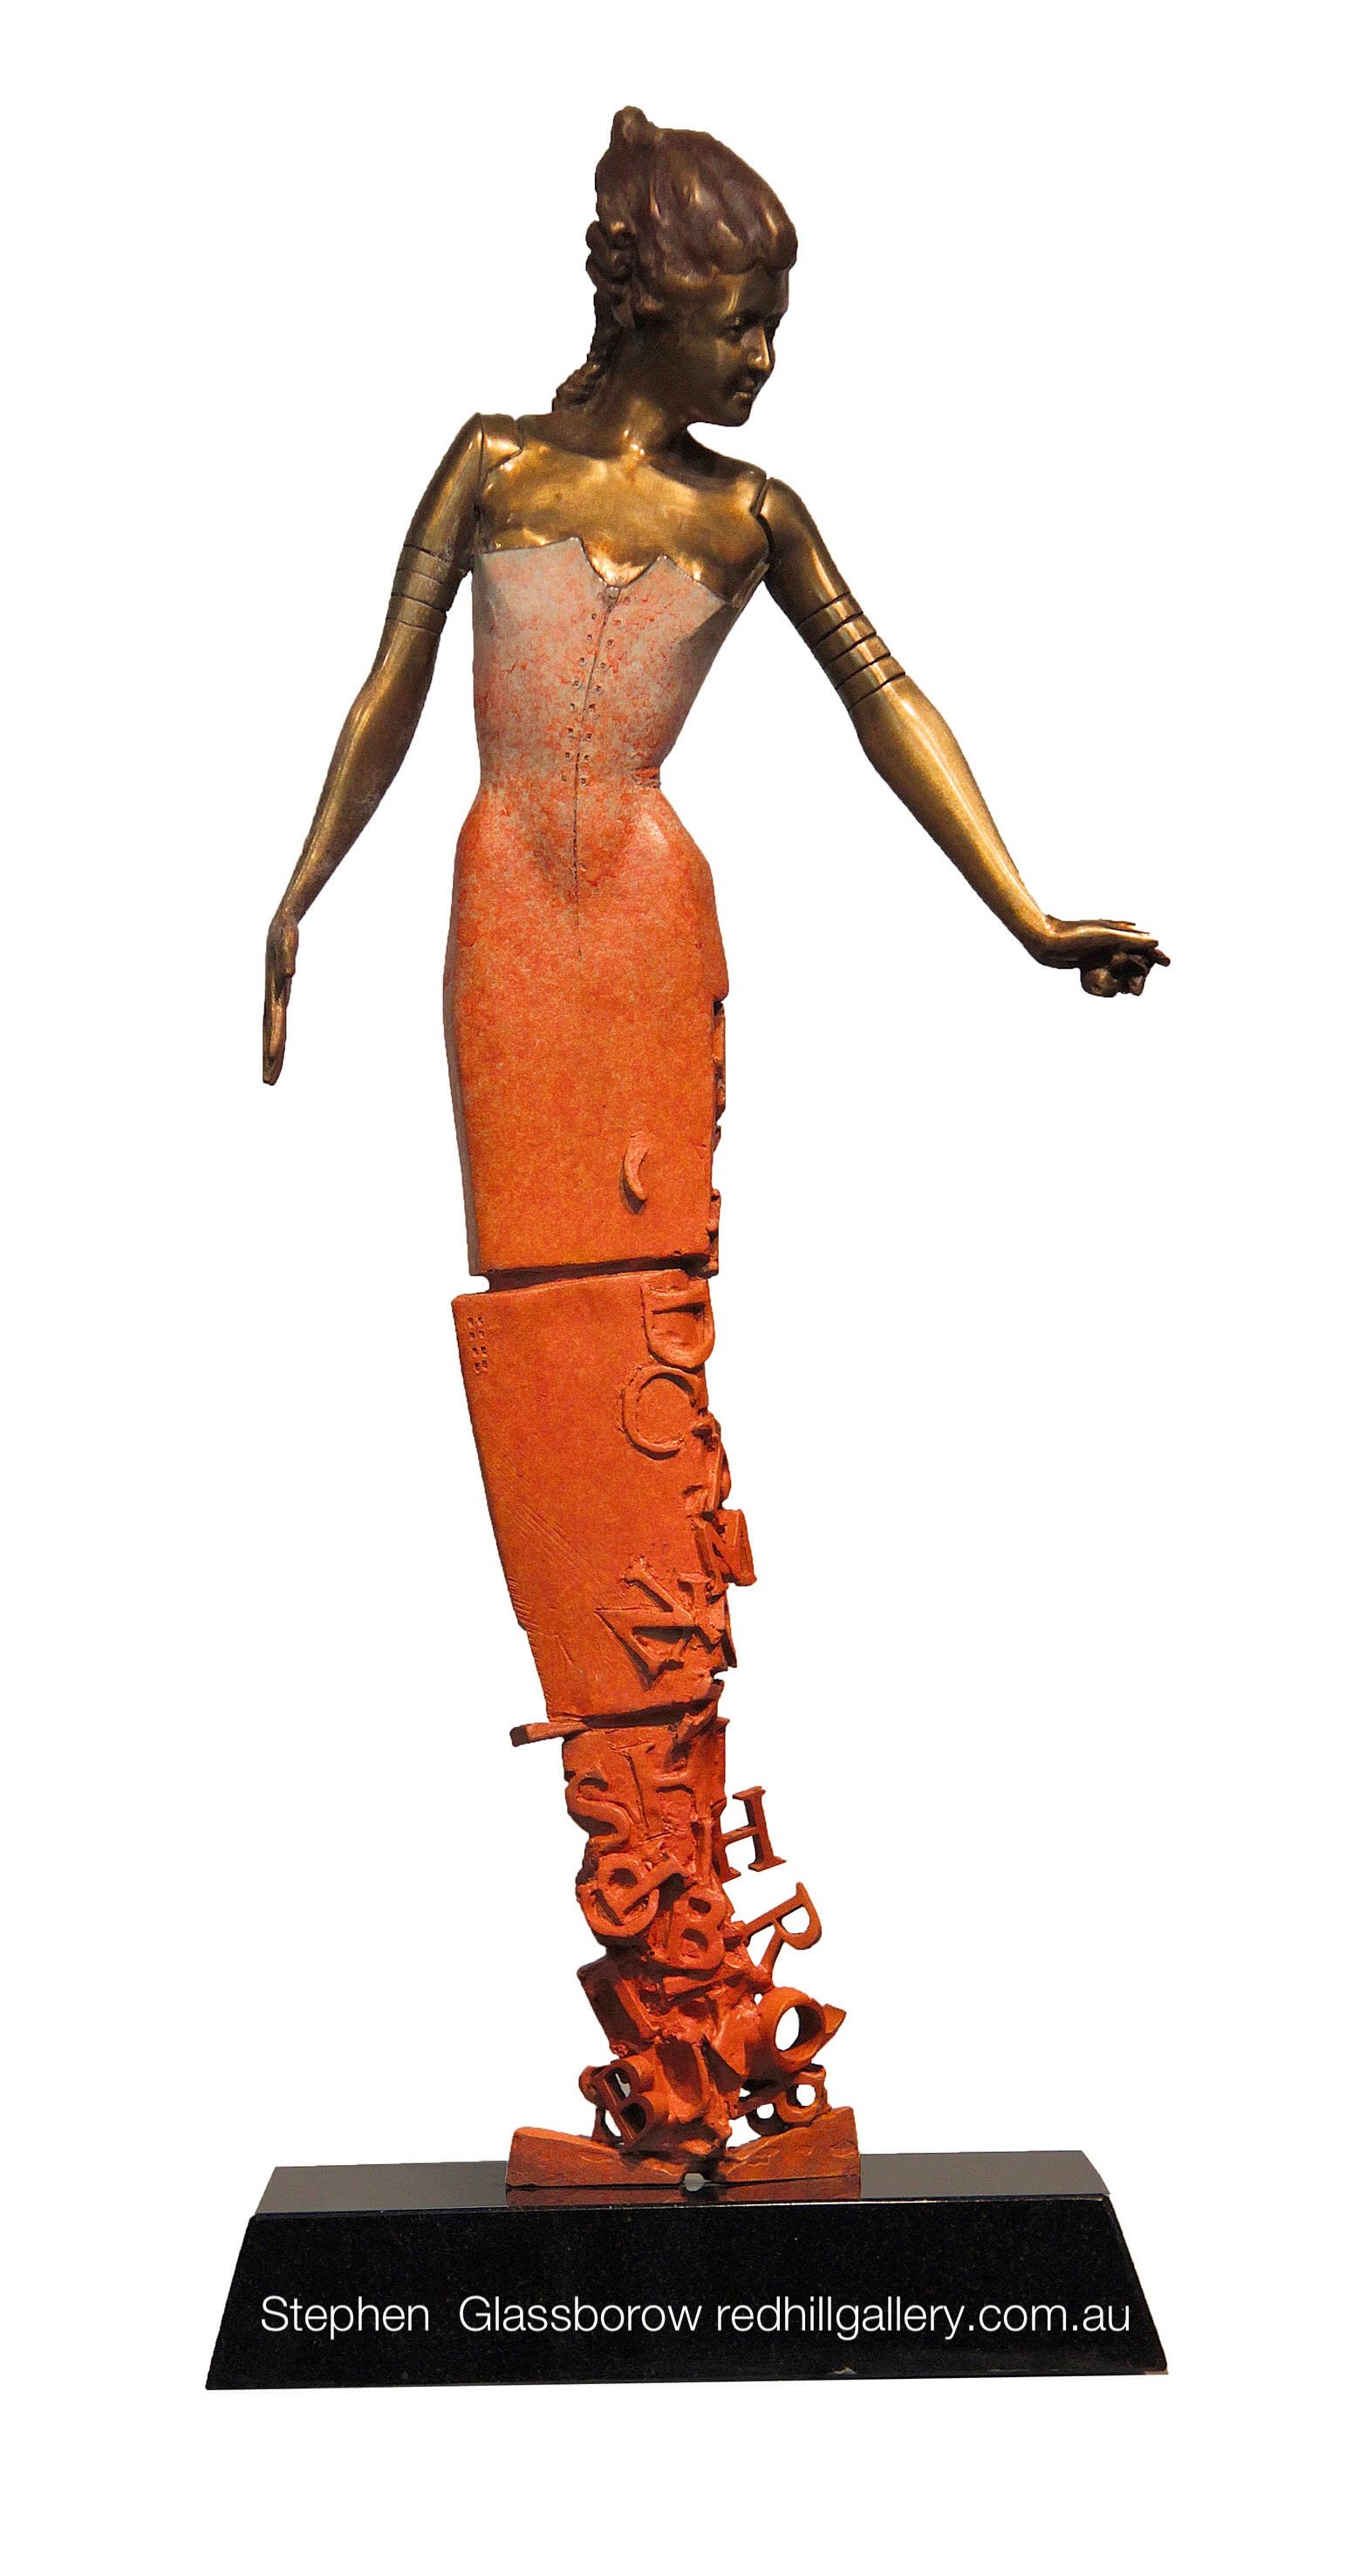 Stephen Glassborow, contemporary bronze sculpture. Red